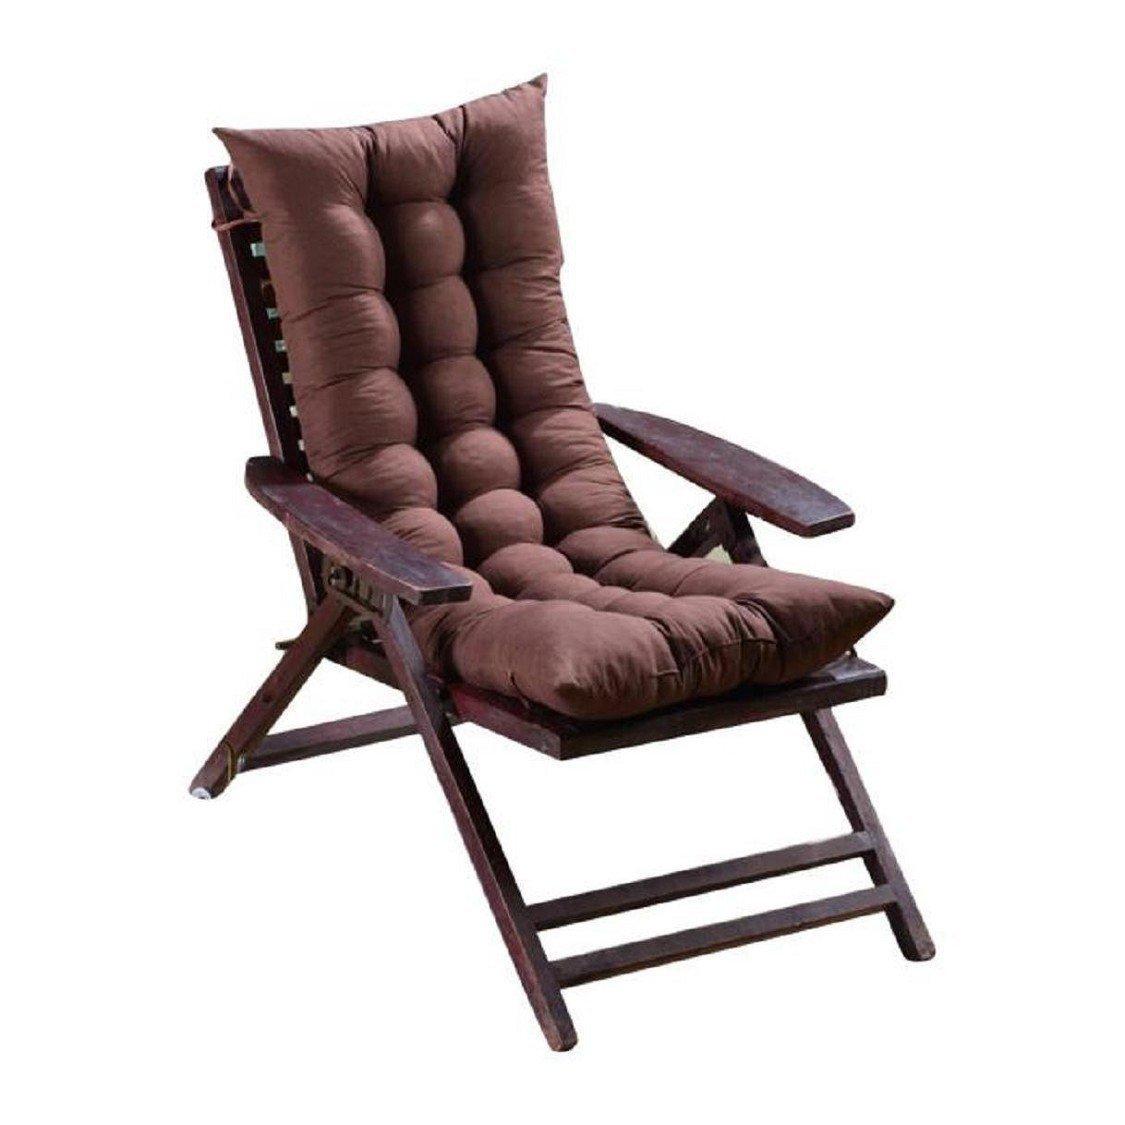 Comfortable Living Room Furniture Inspirational Most fortable Living Room Chair Home Furniture Design